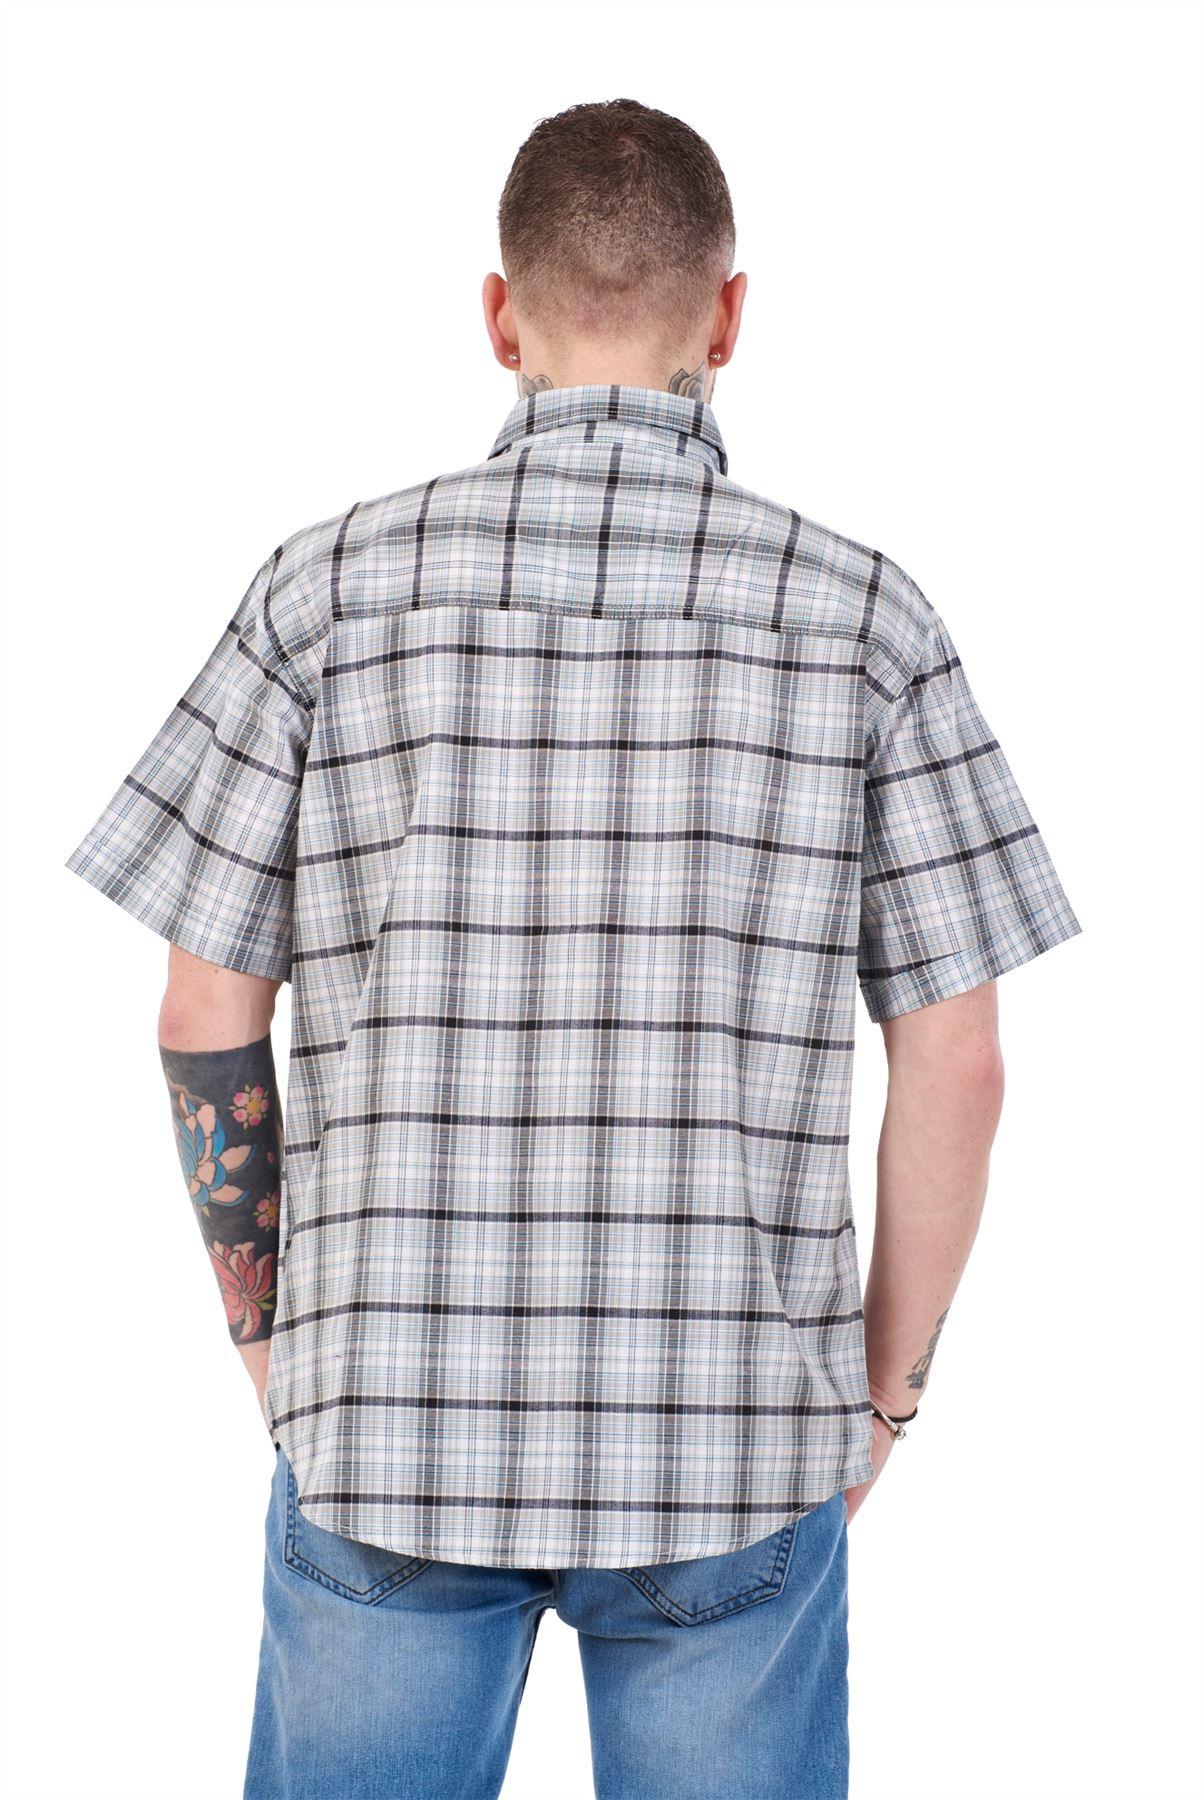 Mens-Regular-Big-Size-Shirts-Checked-Cotton-Blend-Casual-Short-Sleeve-Blue-M-5XL thumbnail 20